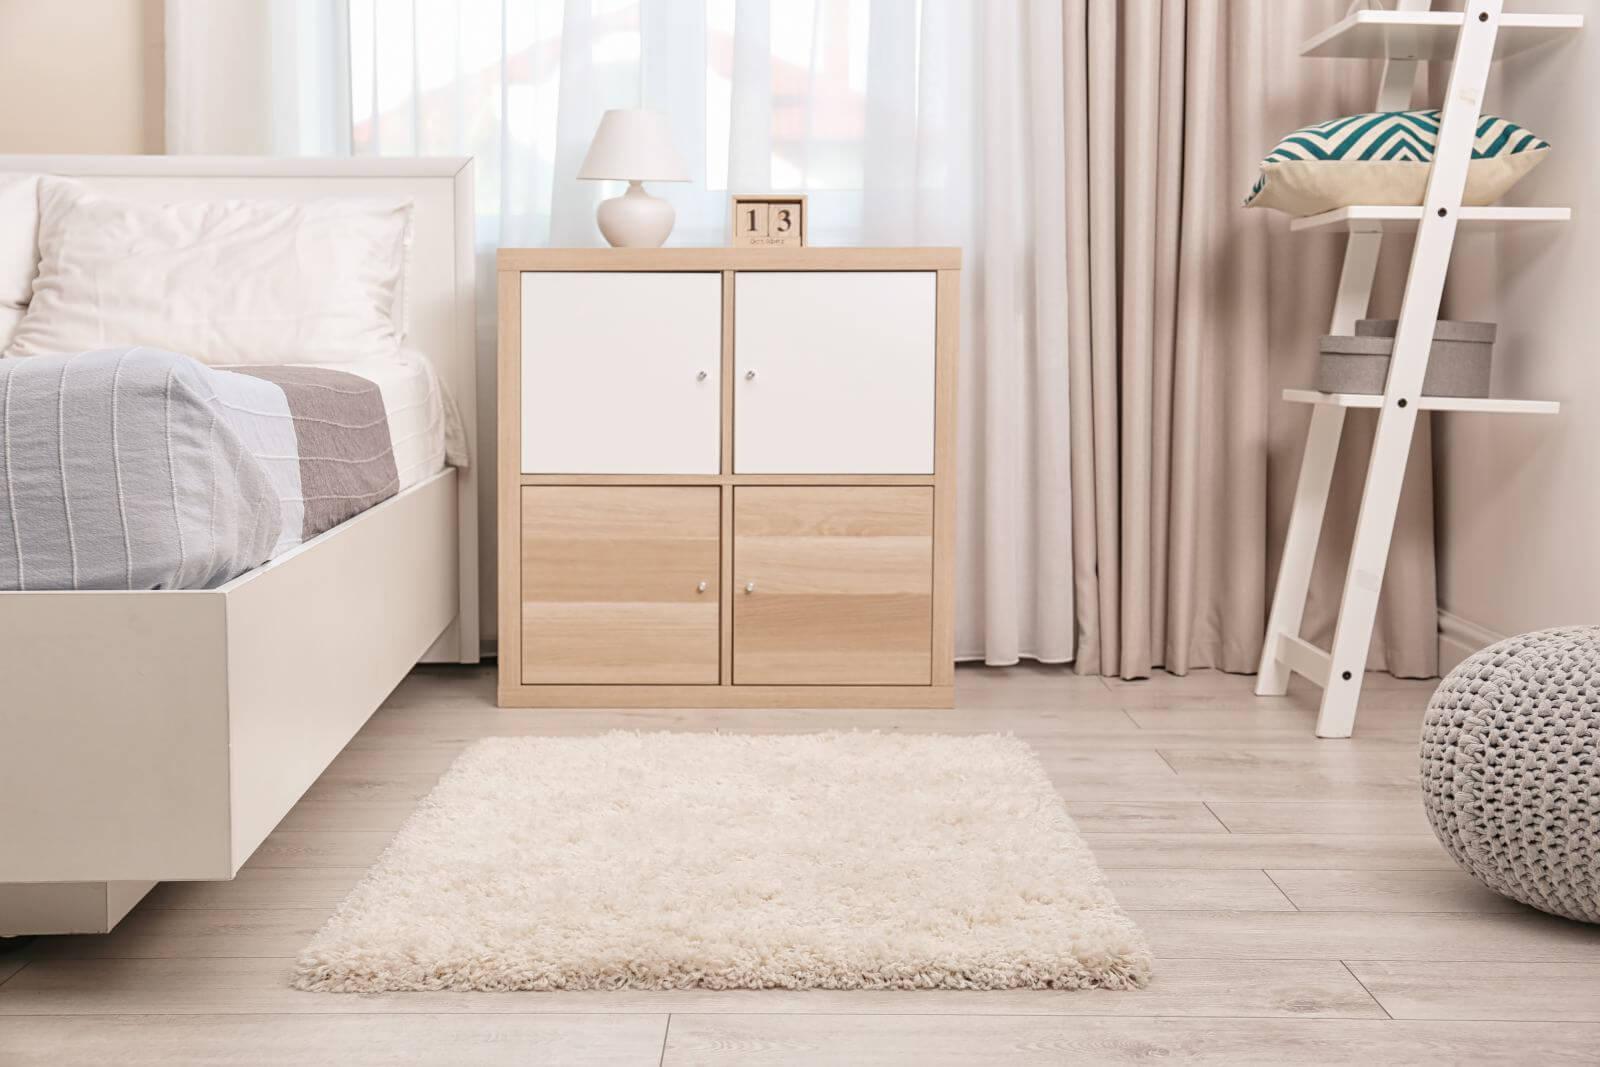 Modern bedroom interior with soft fluffy carpet